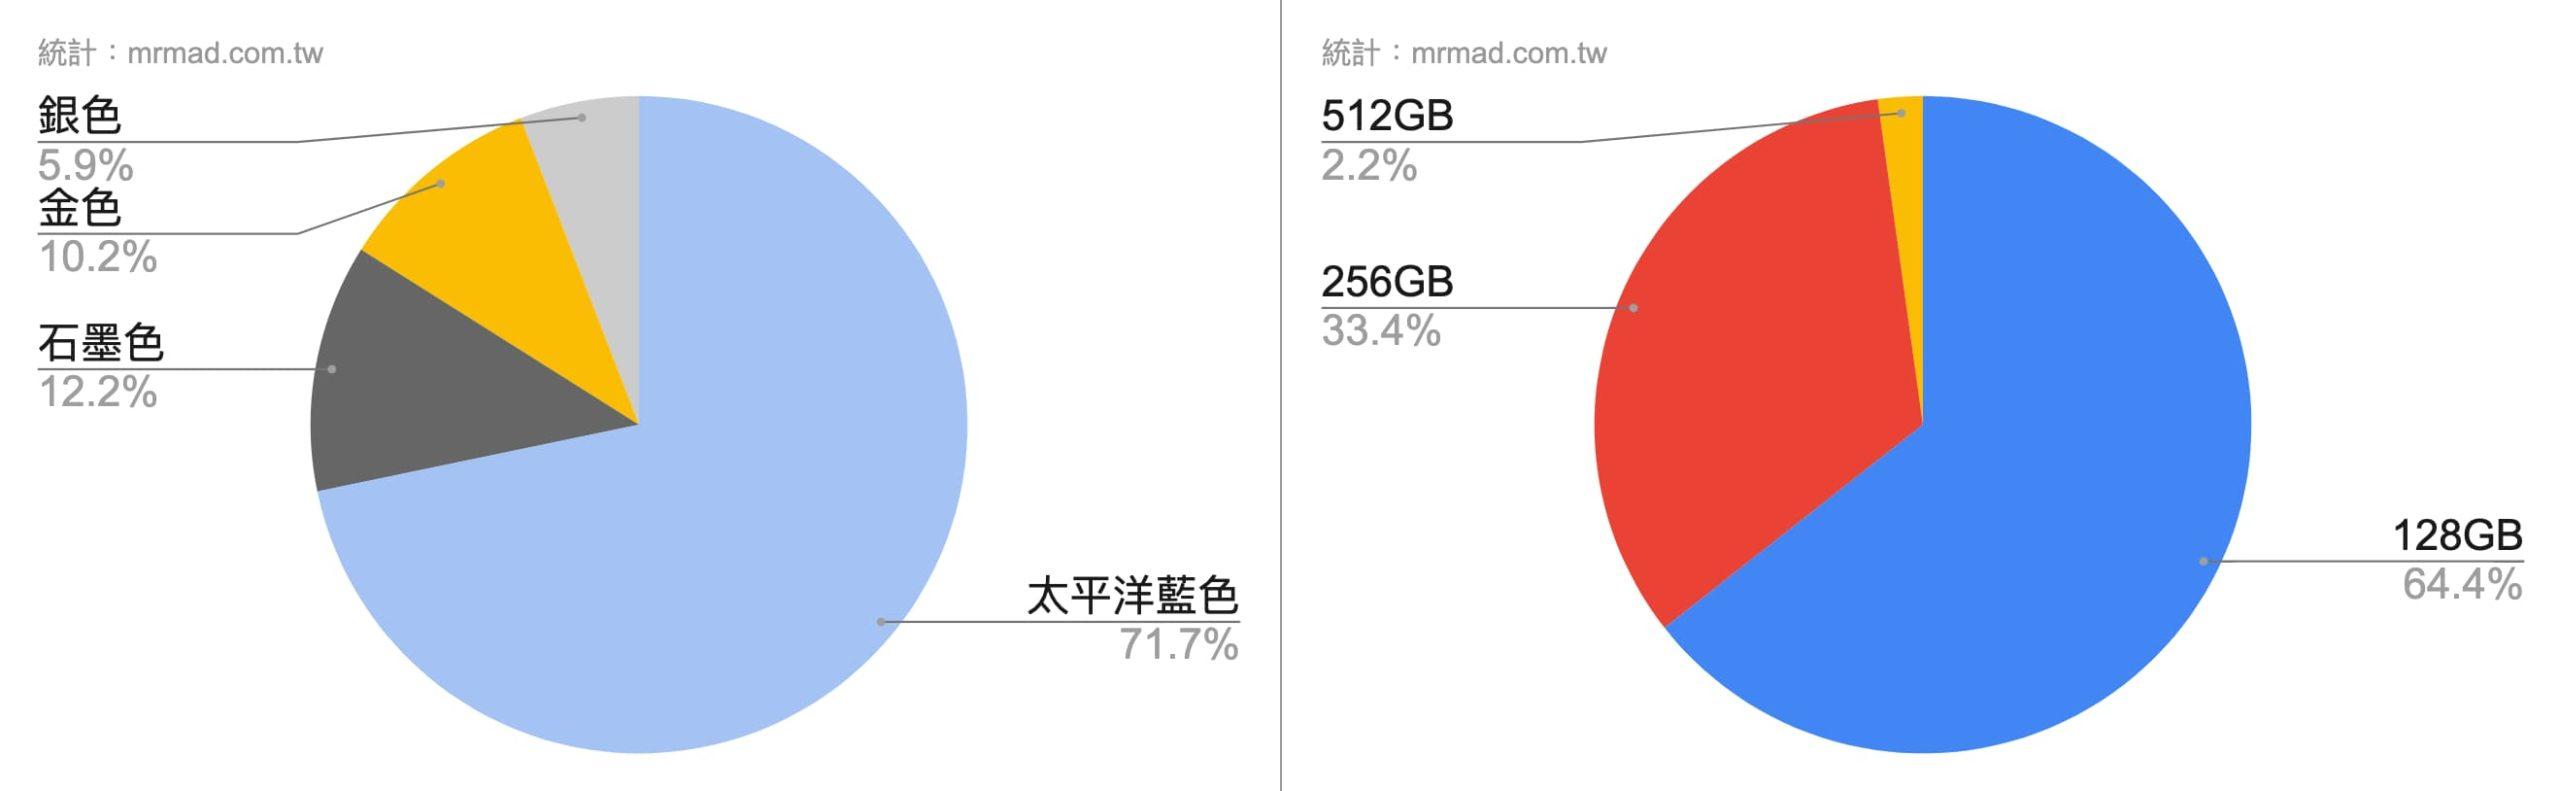 【iPhone 12換機調查出爐】9成舊用戶都想換、新色超熱門